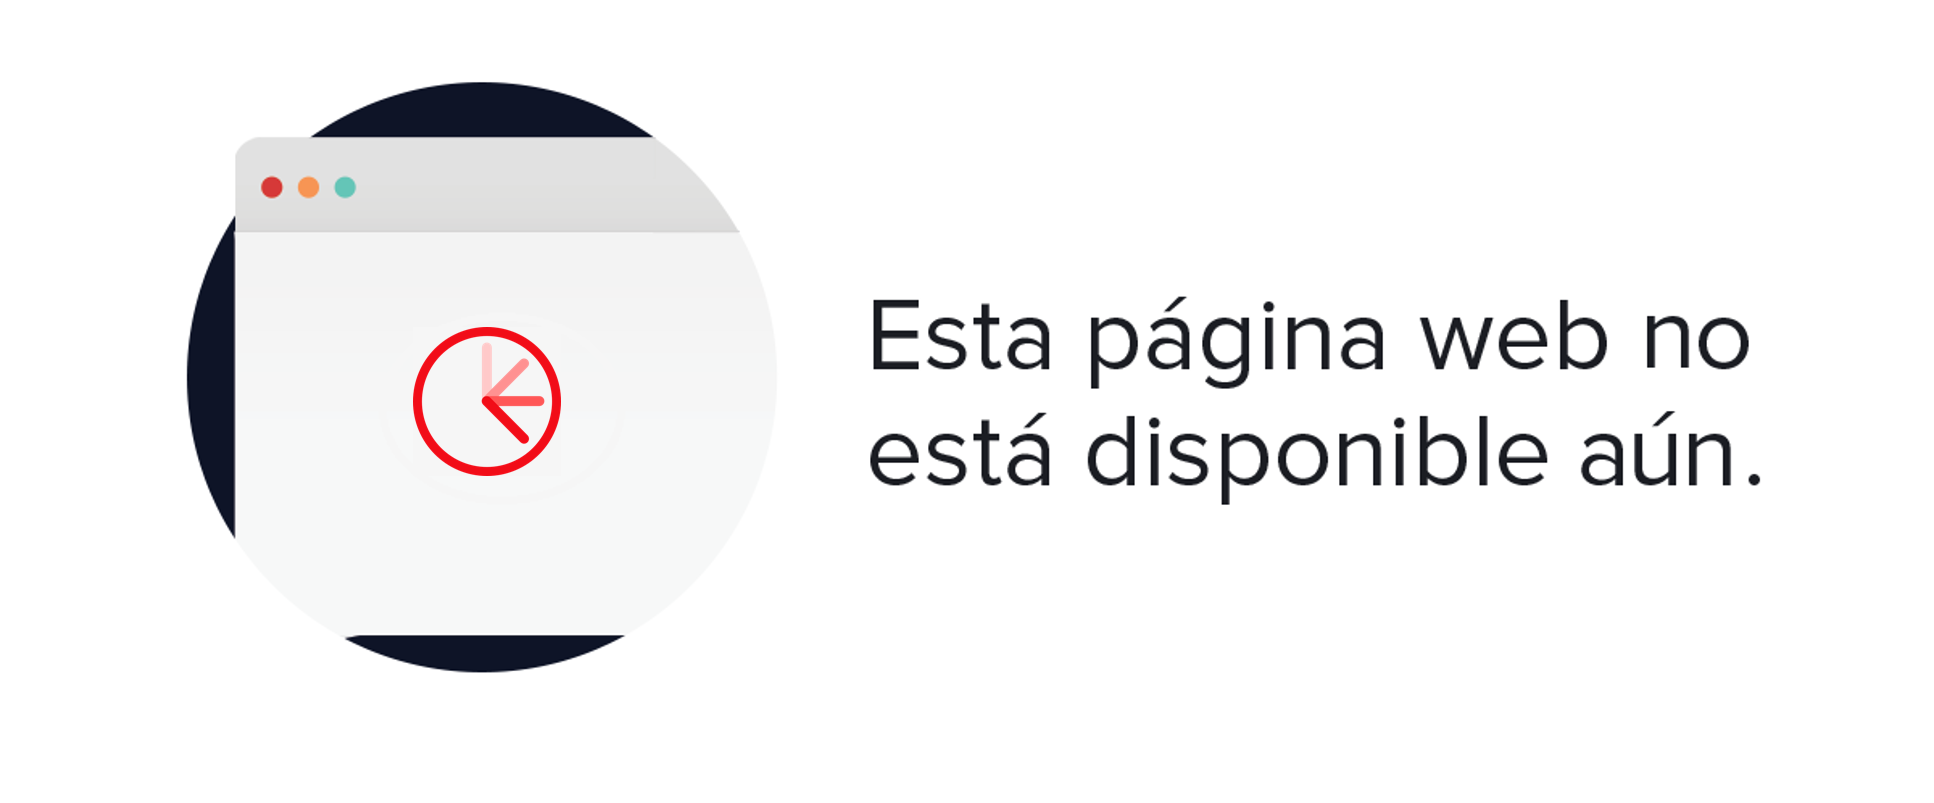 bacdf699d61 Bolsos-Mujer-Bolsos-de-mano-CHIARA-P-BOLSOS-Bolsos-de-mano-on-YOOX.com-RosaVerdeNaranjaNegroBlancoAzul-Q02PElDb.jpg